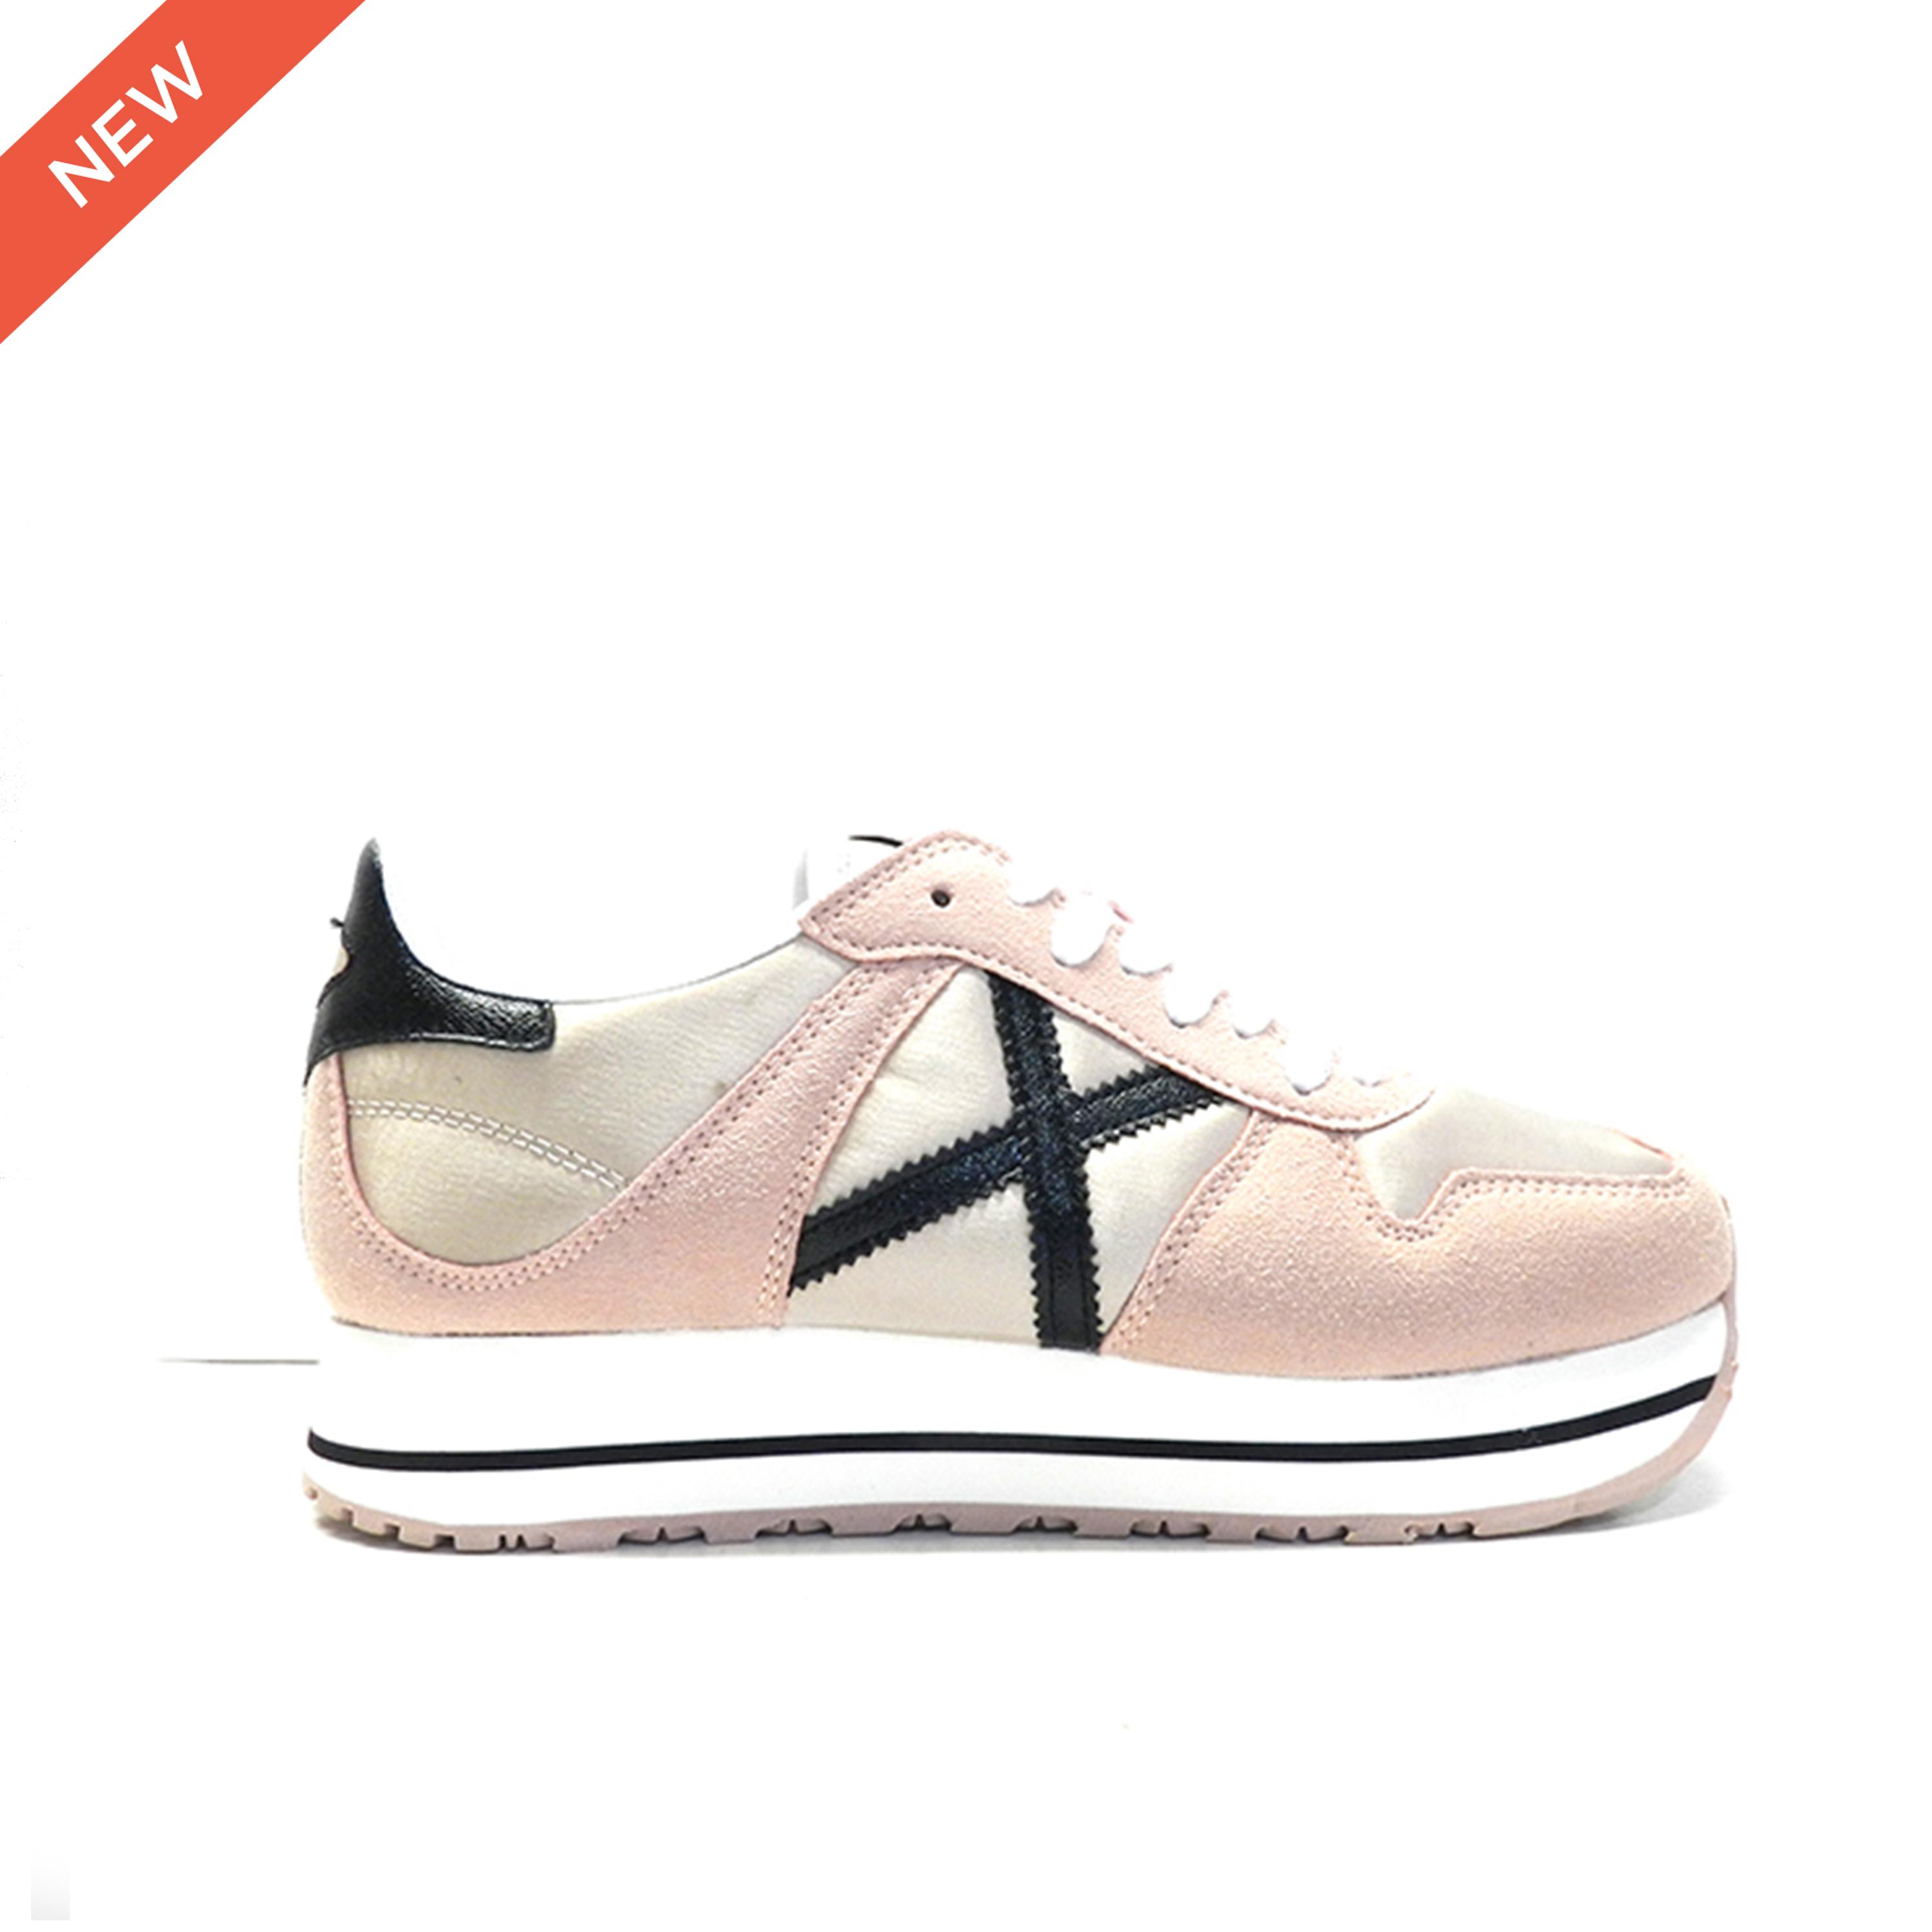 b69b8df1 Online Zapatos mujer Zapatos Escala hombre Zapatos Sabates ZdxO5wEE